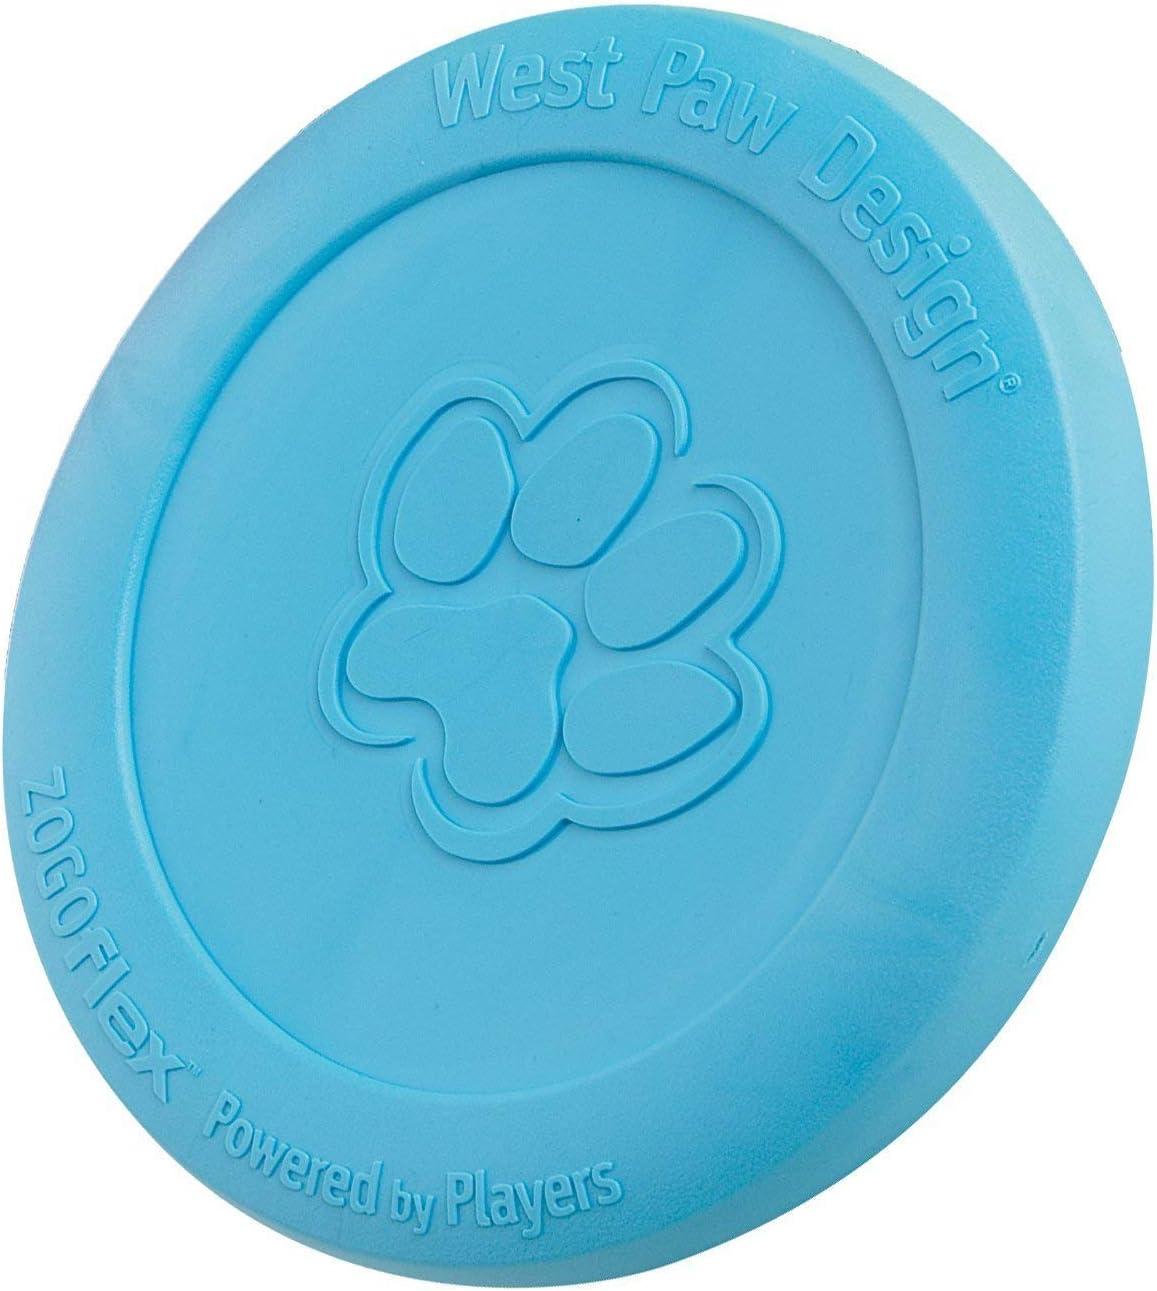 Fetch Floatable Pet Toys for Aggressive Chewers /& Zogoflex Hurley Dog Bone Chew Toy Large, Aqua Large, Aqua West Paw Zogoflex Zisc Dog Frisbee Catch